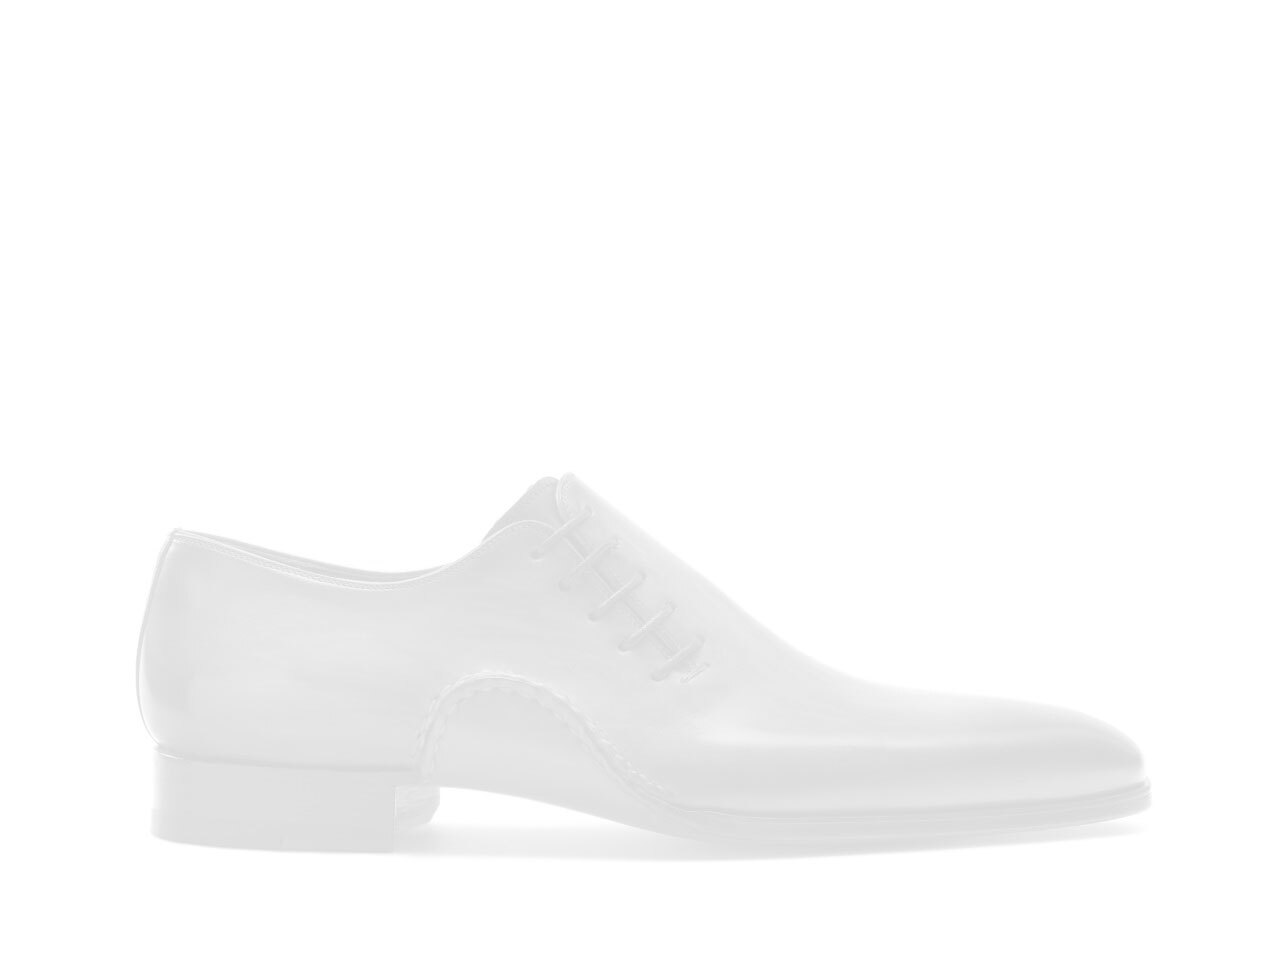 Sole of the Magnanni Rafa II Grey Men's Loafers